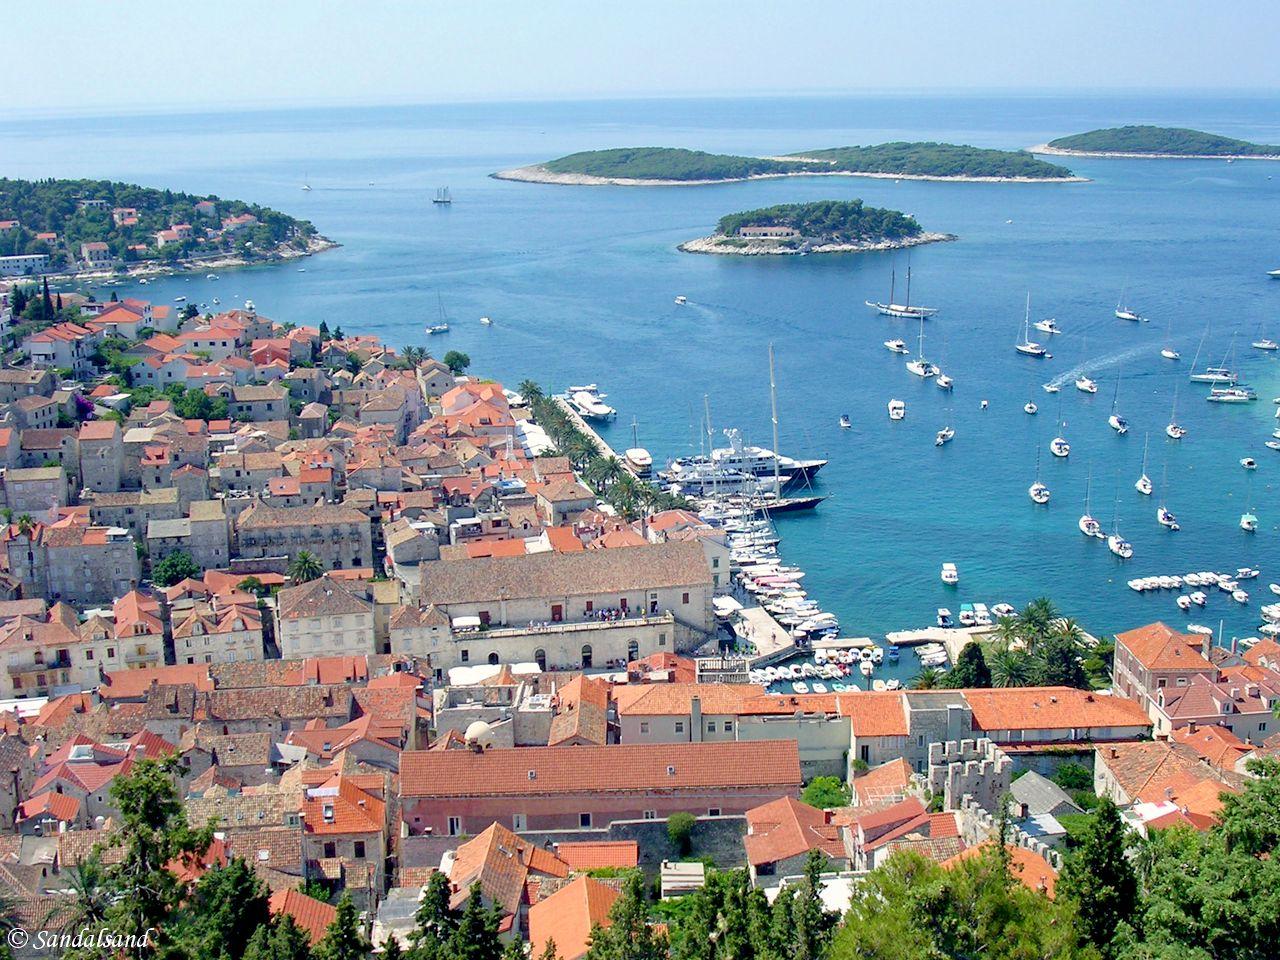 Croatia - View of Hvar City from the citadel